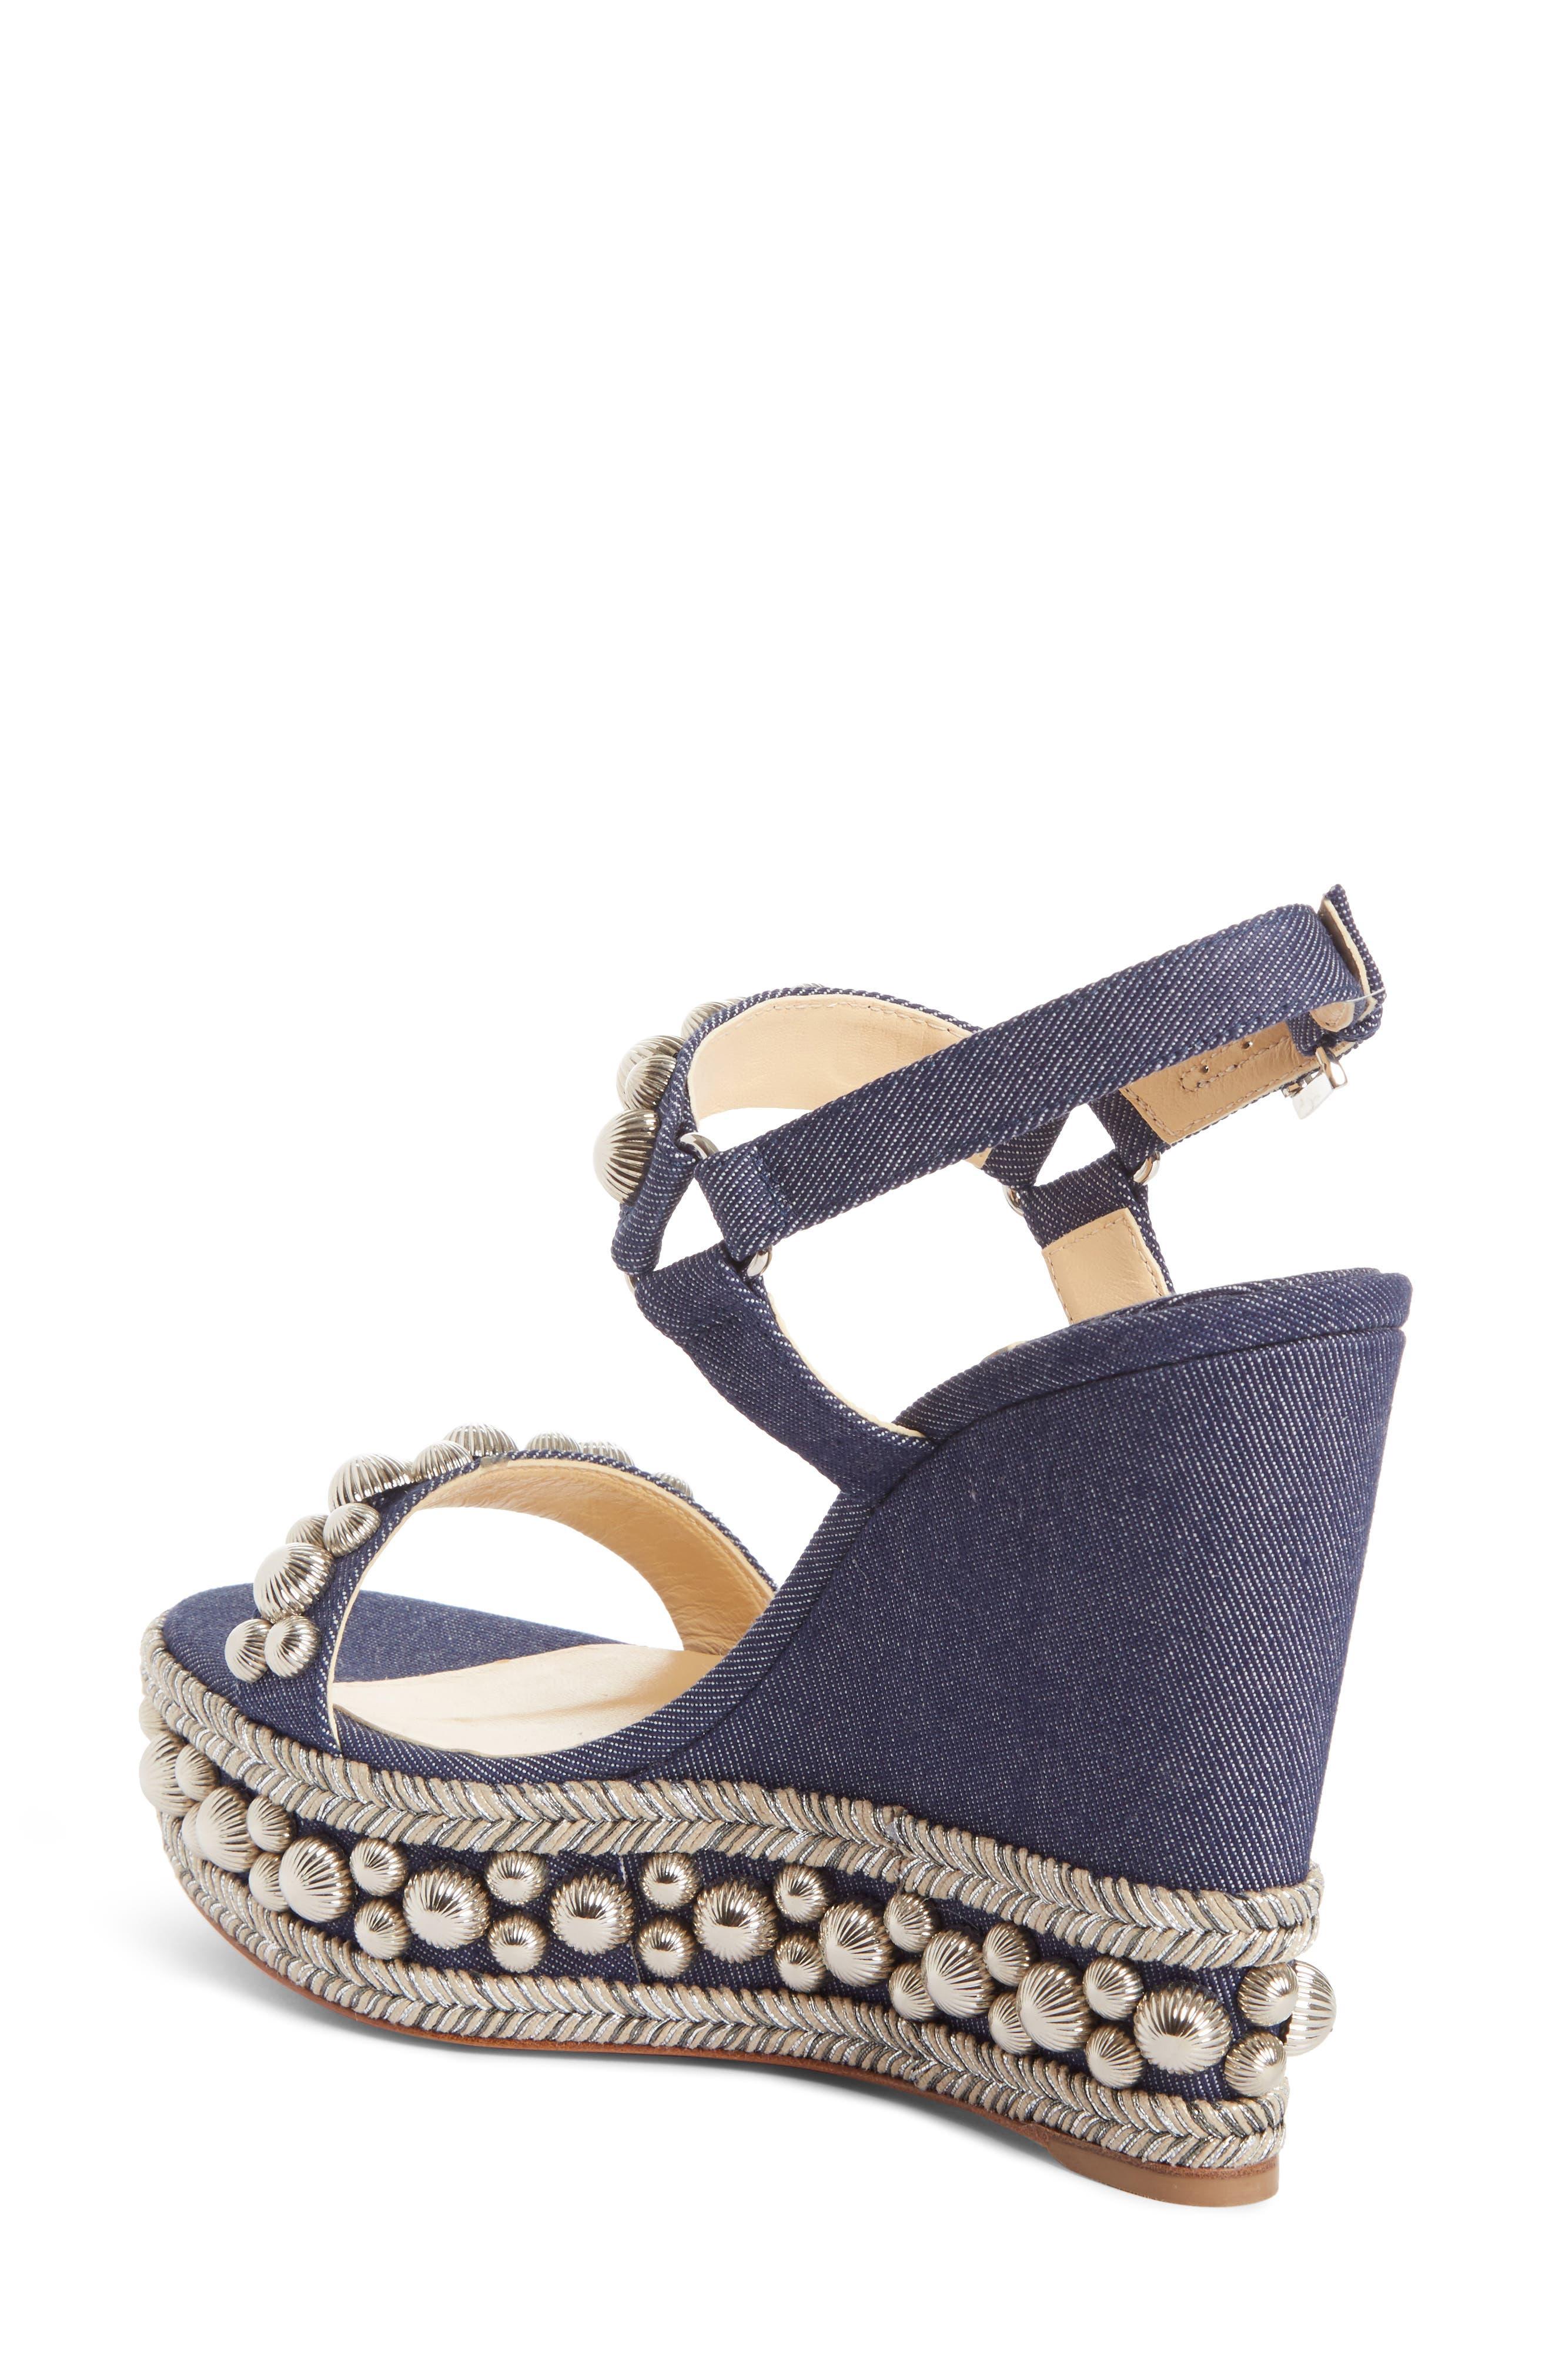 Rondaclou Studded Wedge Sandal,                             Alternate thumbnail 2, color,                             Denim Blue